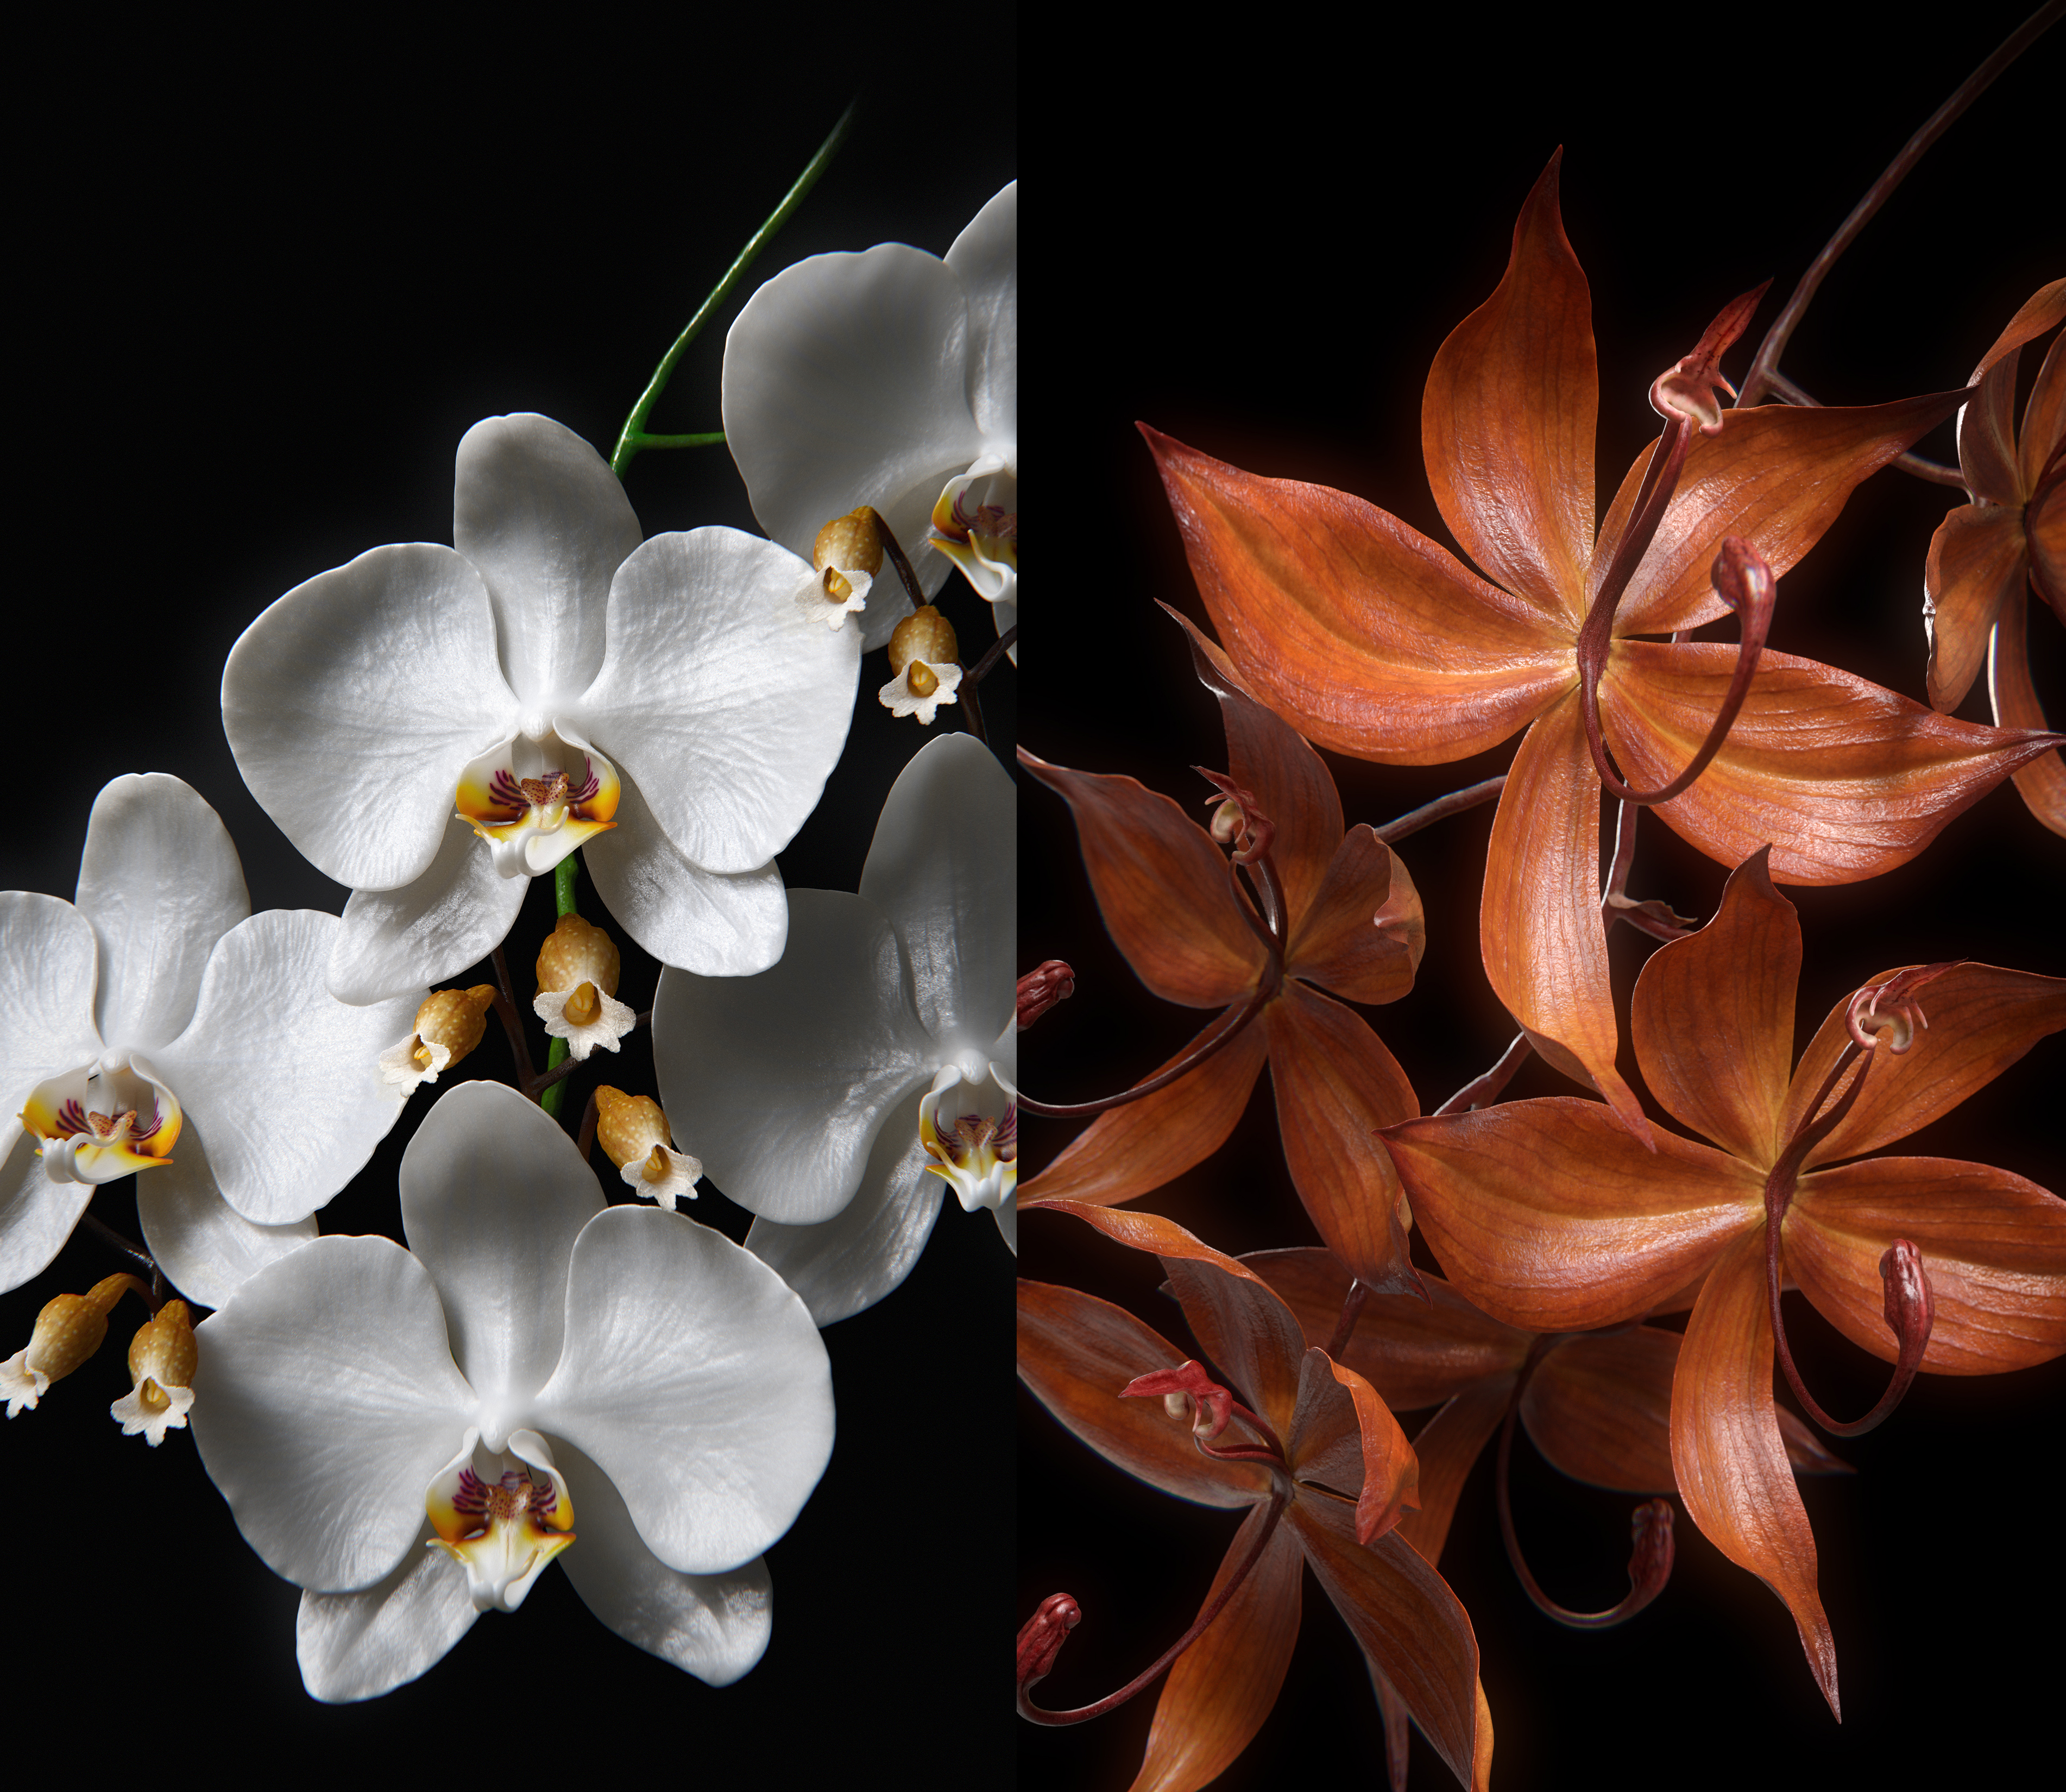 Guerlain Orchidée Series